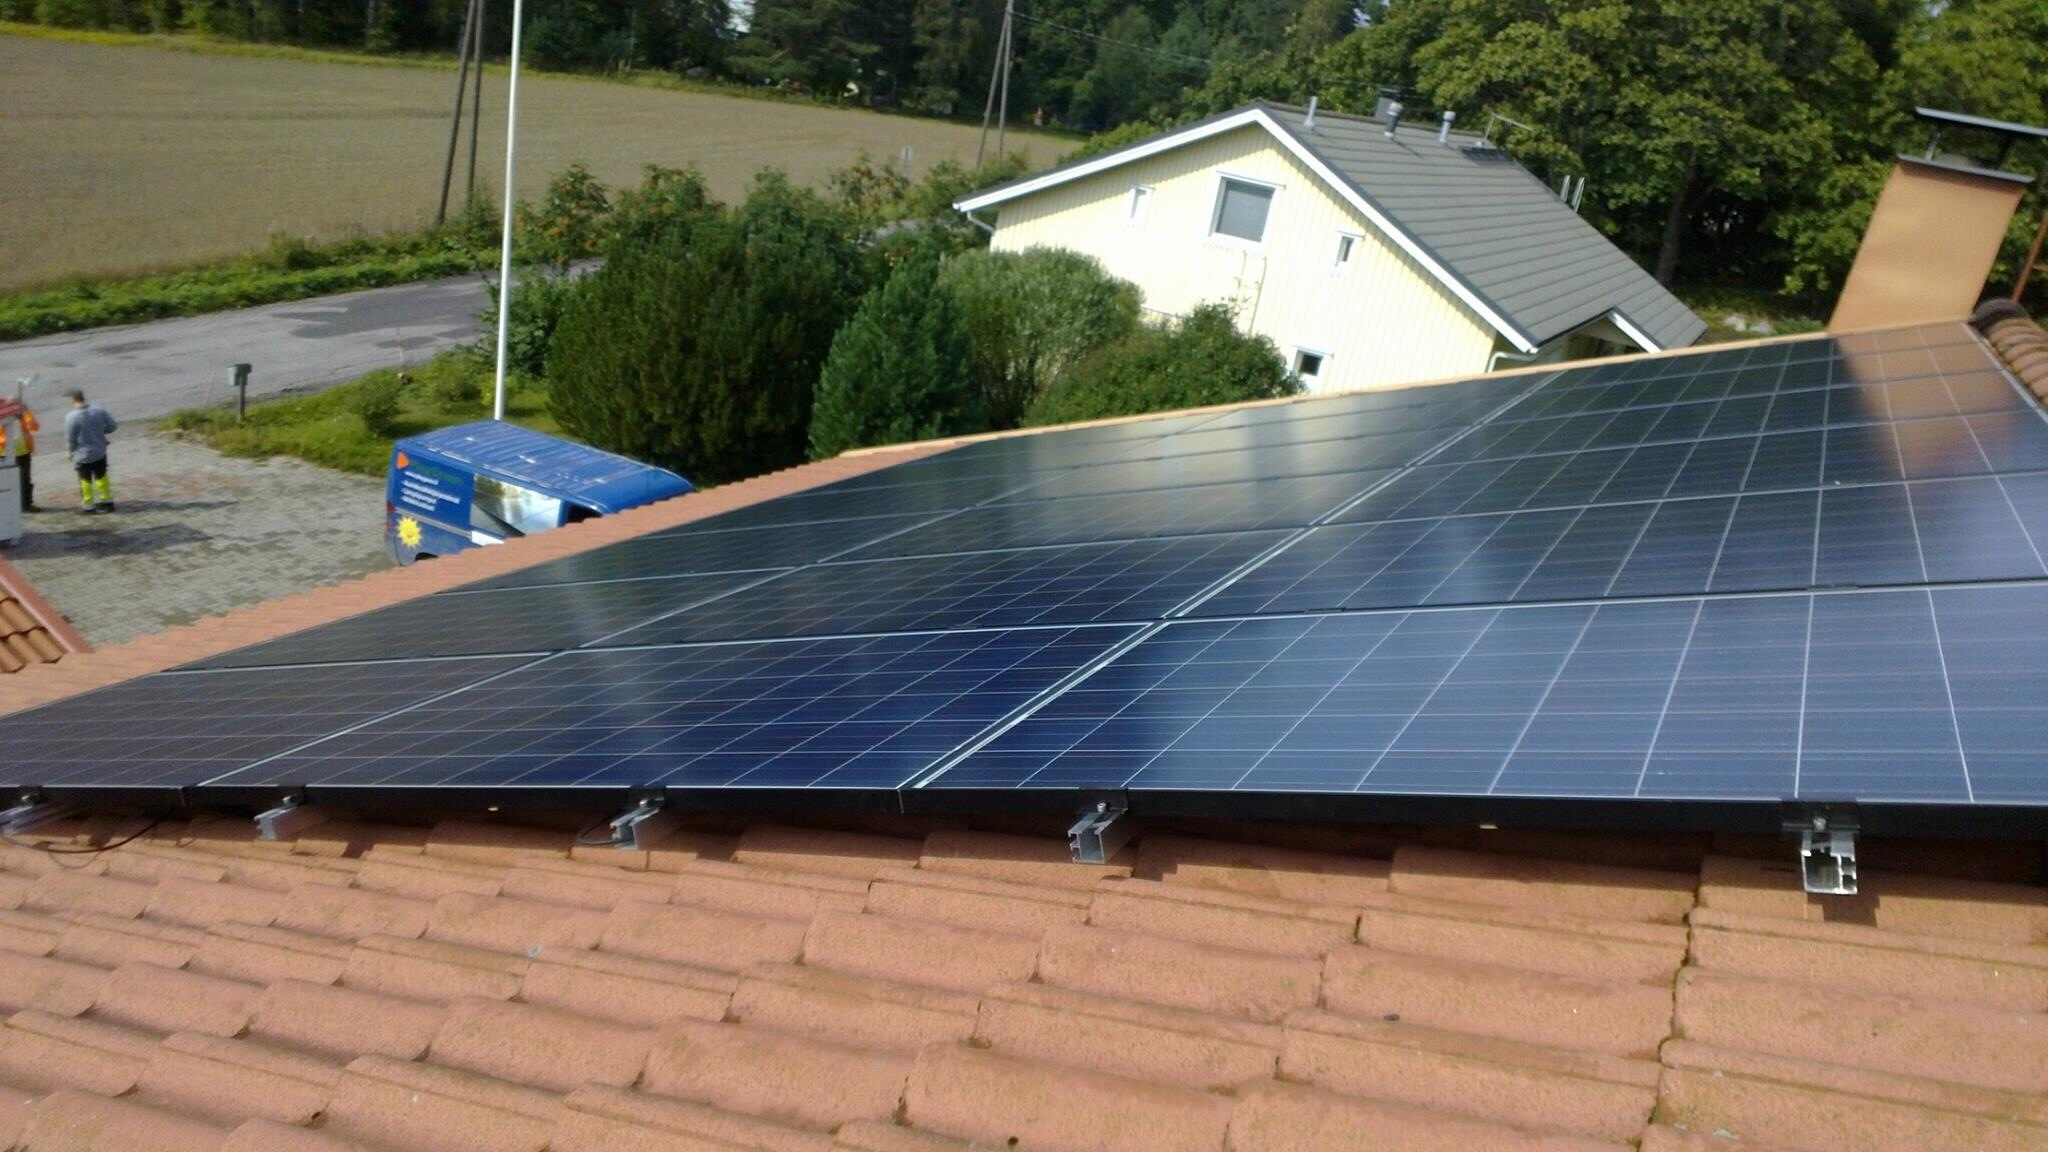 Vantaan Energia Yhteystiedot